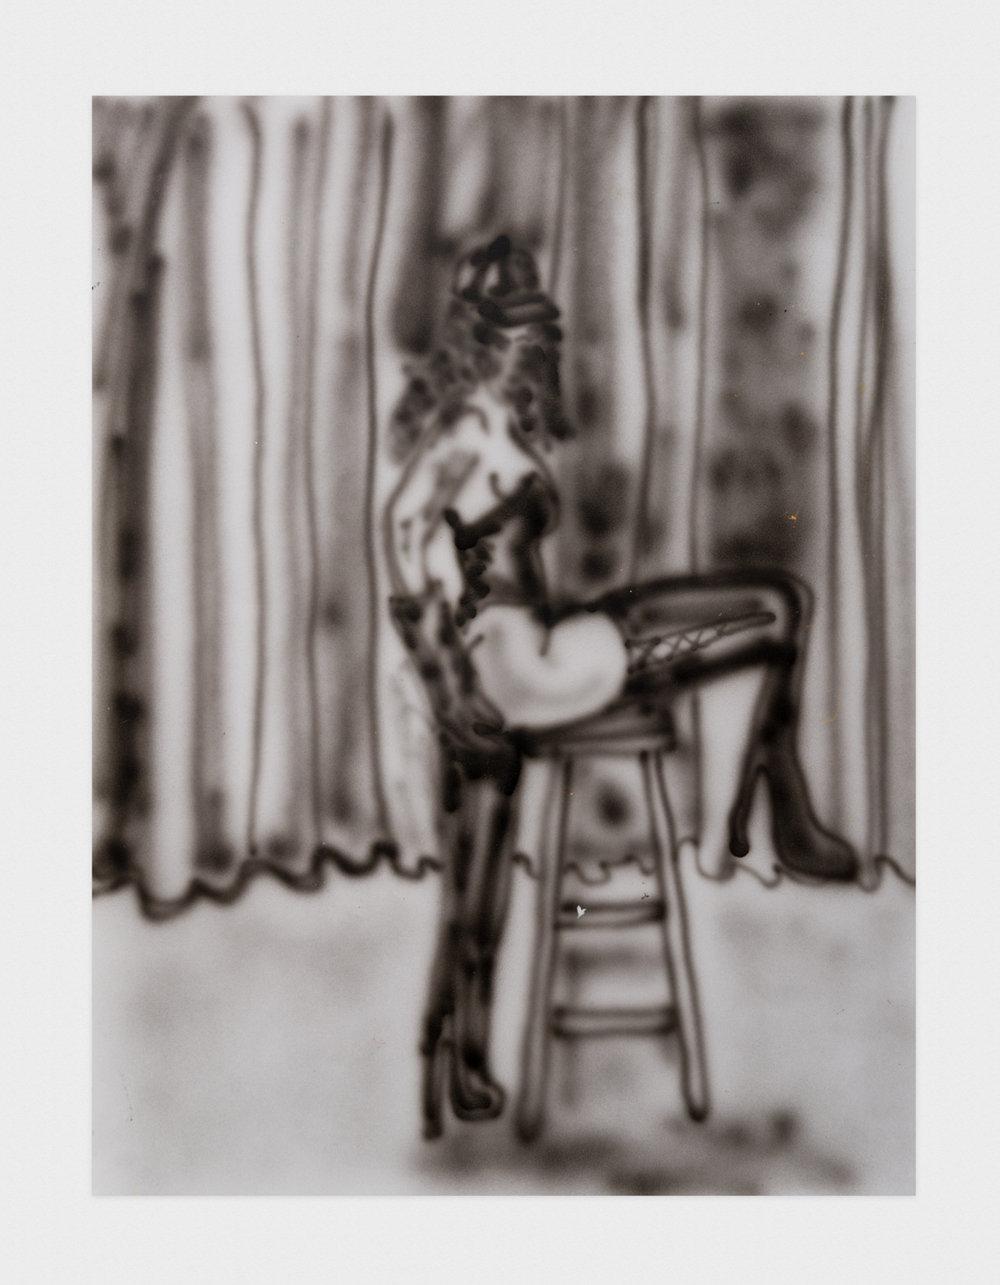 Alex Becerra  Open 24/7 Girls  2016 Airbrush on paper 24h x 18w in AB136